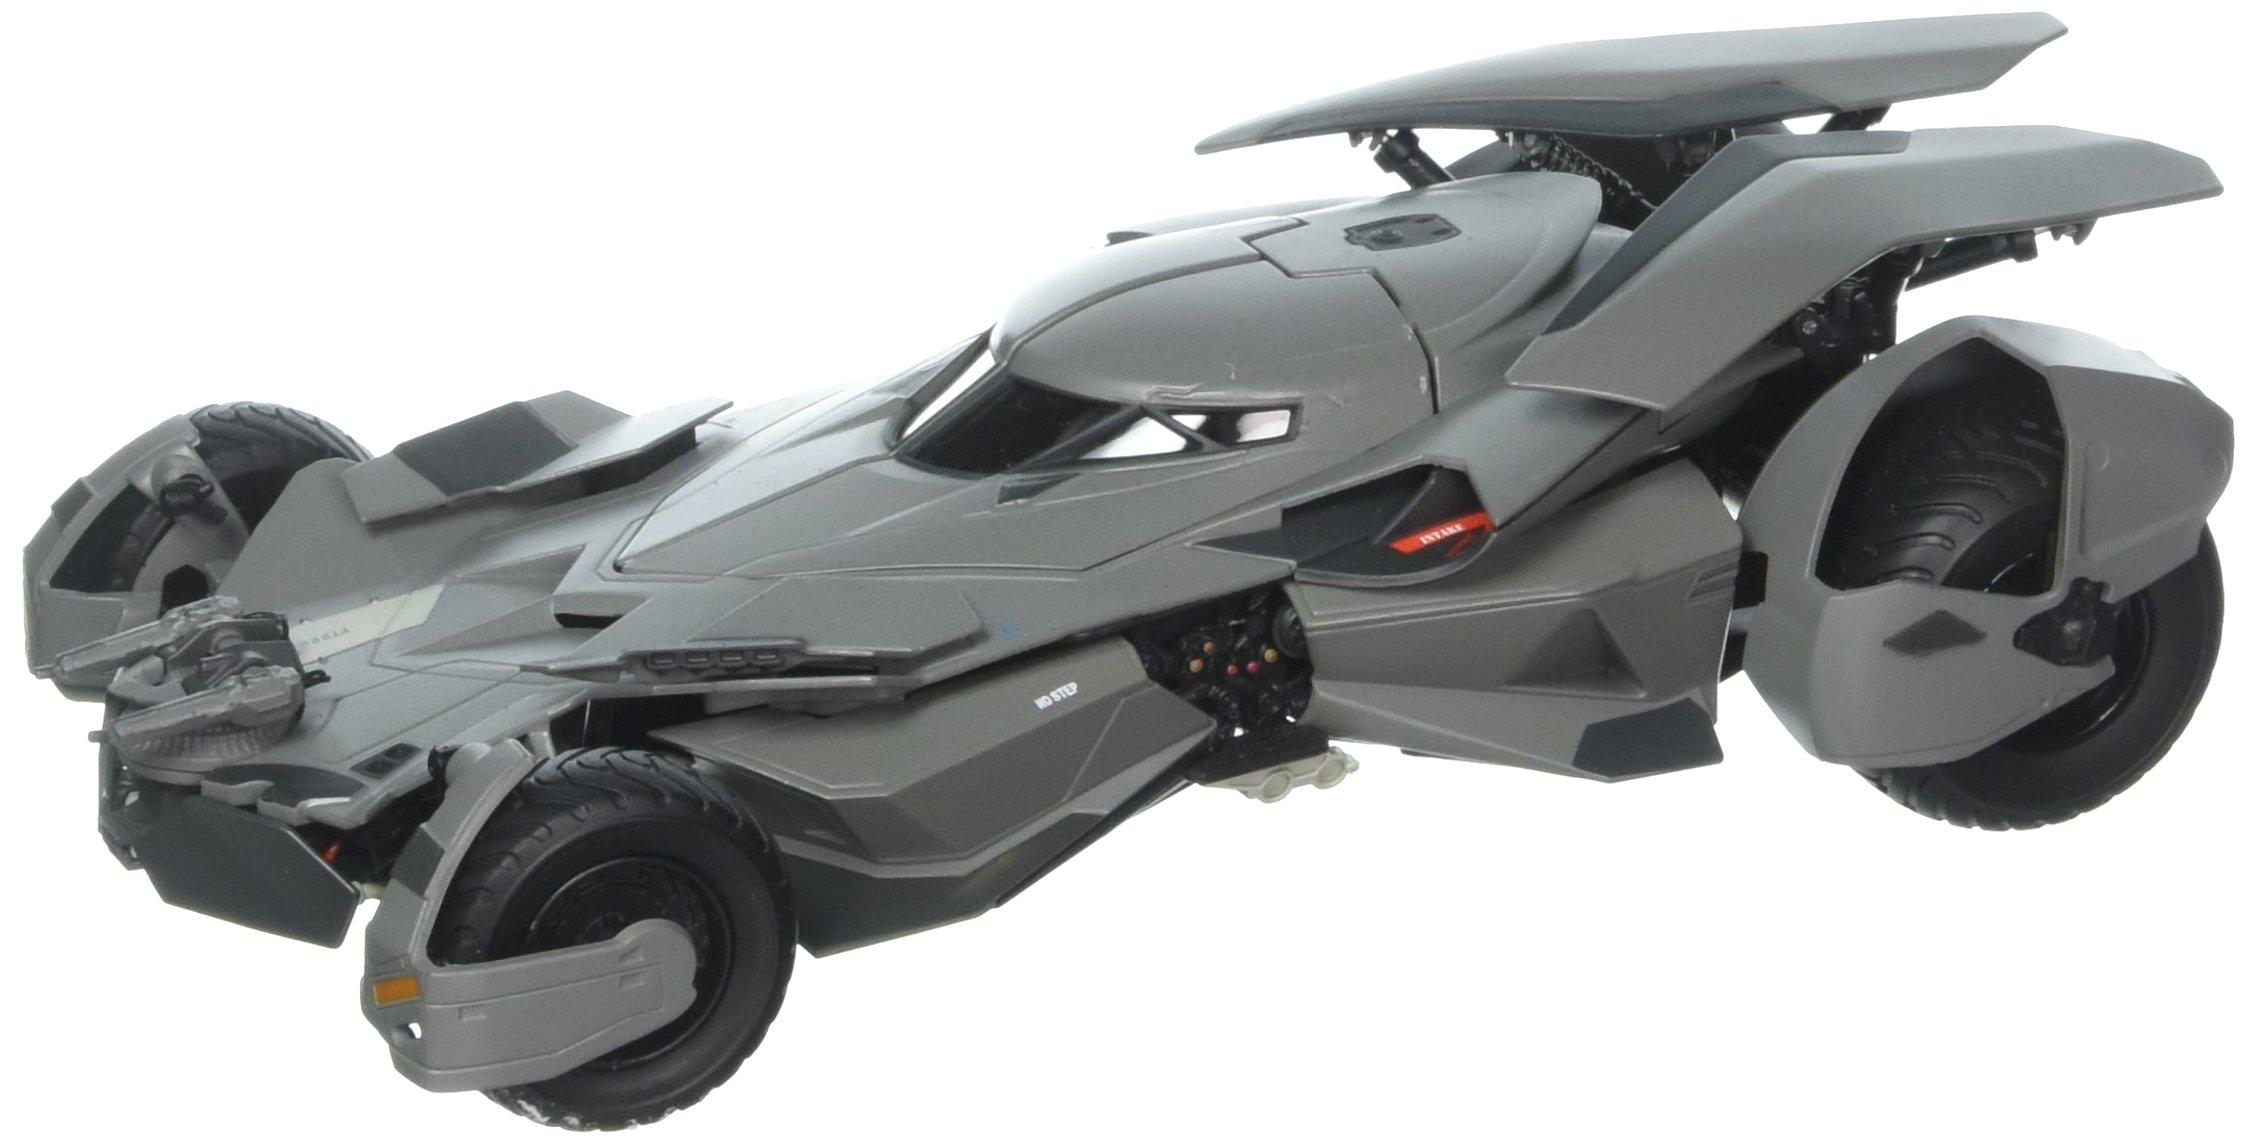 Hot Wheels Elite Batman vs. Superman: Dawn of Justice Batmobile Die-cast Vehicle (1:18 Scale)